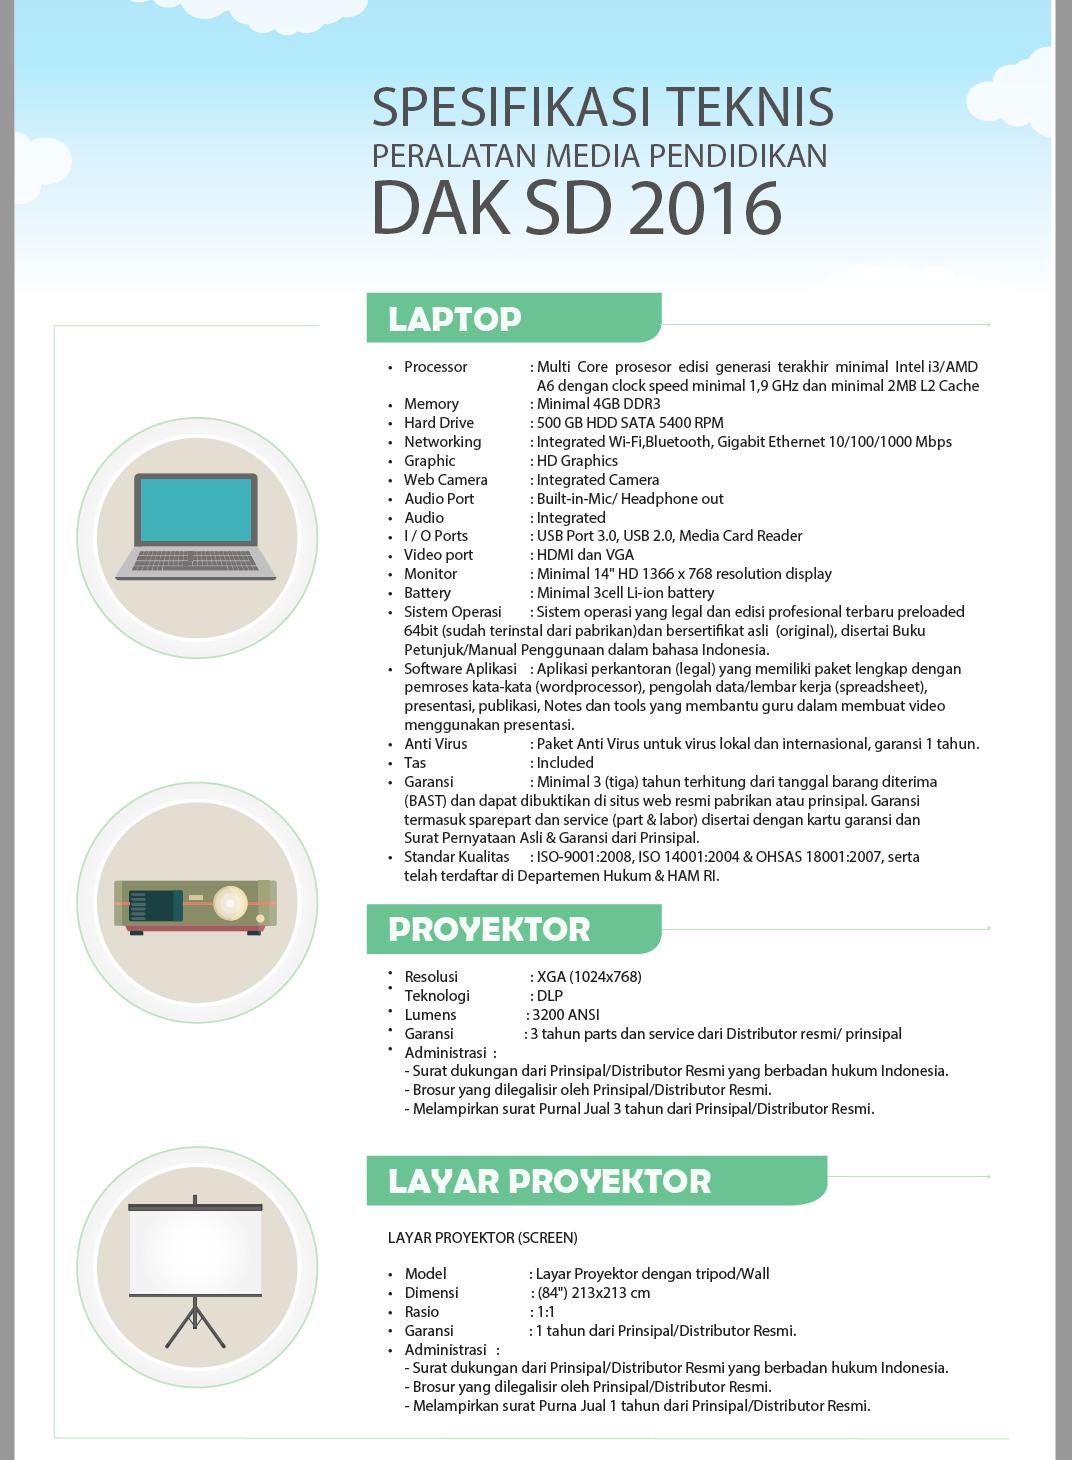 Brosur SIDIA - DAK SD 2016